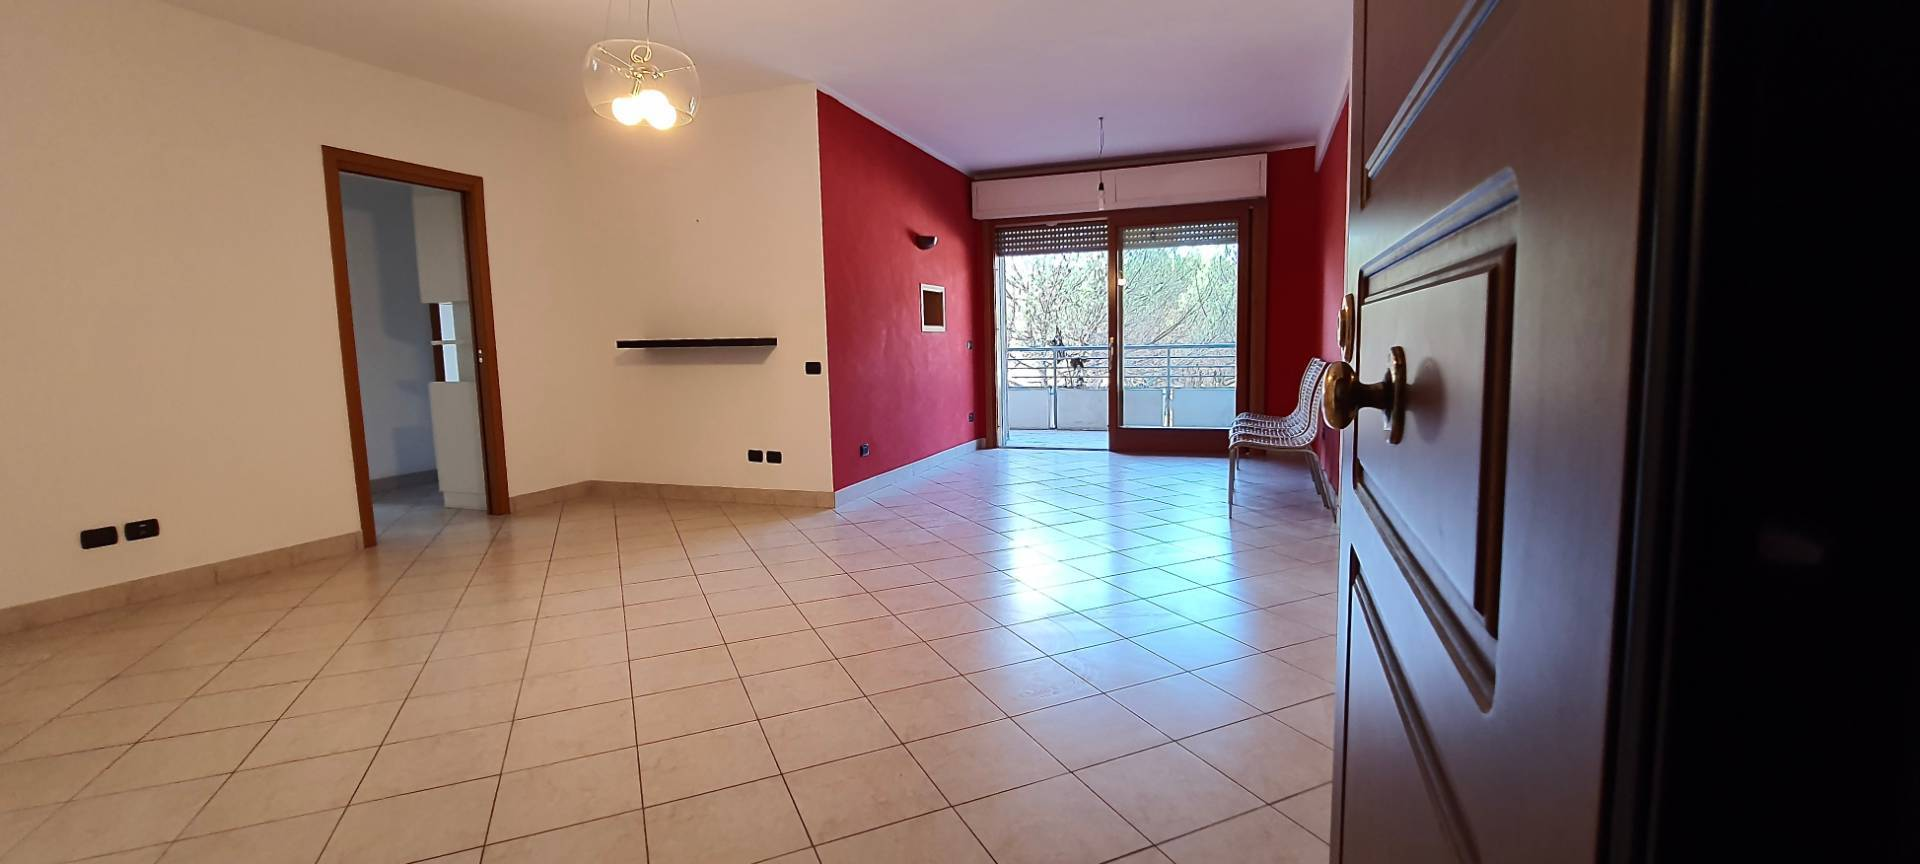 roma affitto quart: grotta perfetta coldwell-banker-prime-properties